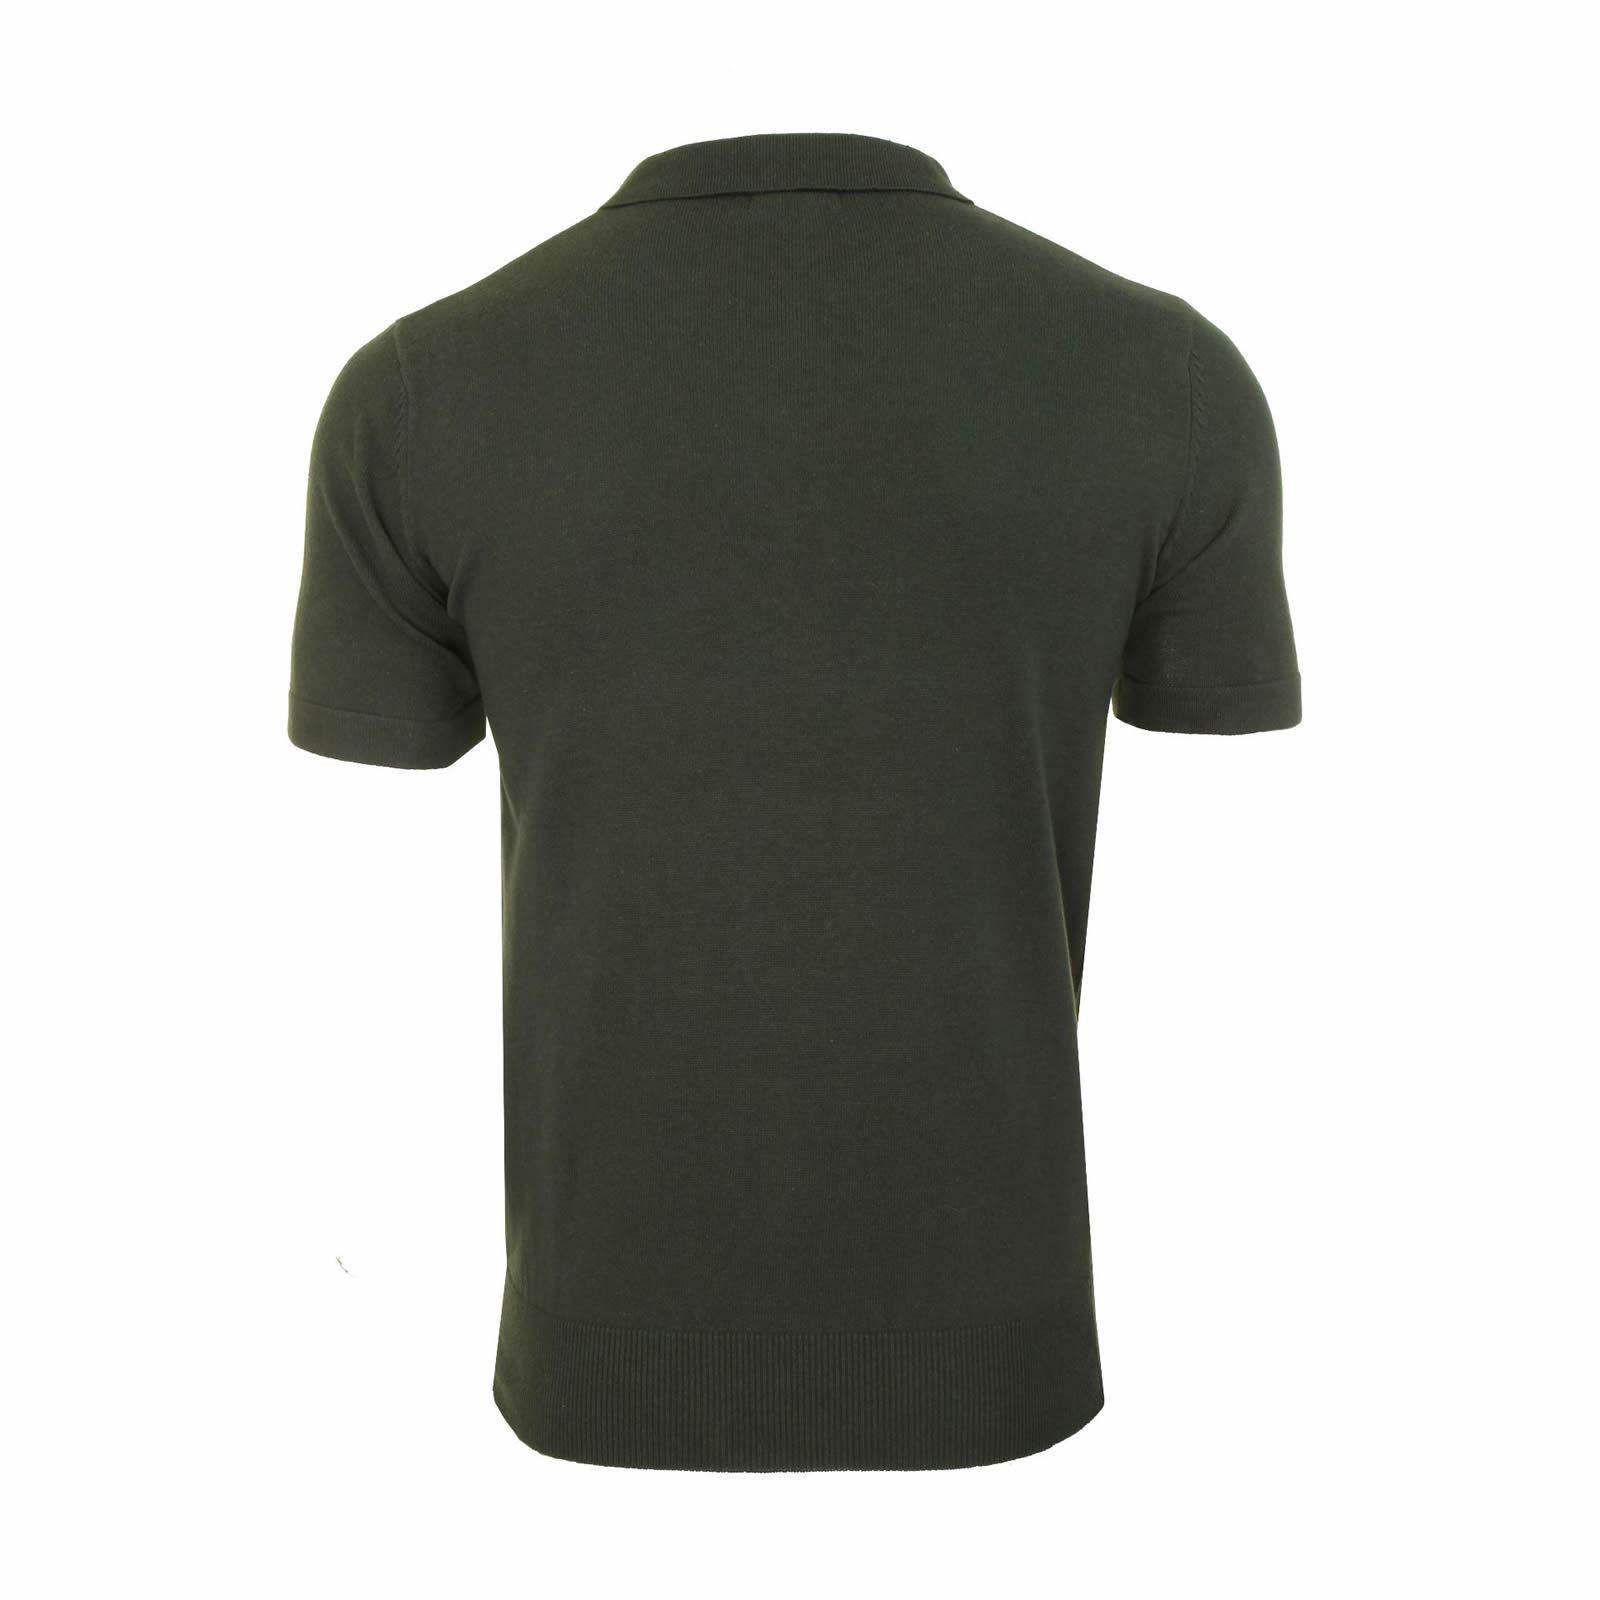 Mens-Knitted-Polo-Brave-Soul-Columbus-Collared-Short-Sleeve-Jumper-T-Shirt thumbnail 7